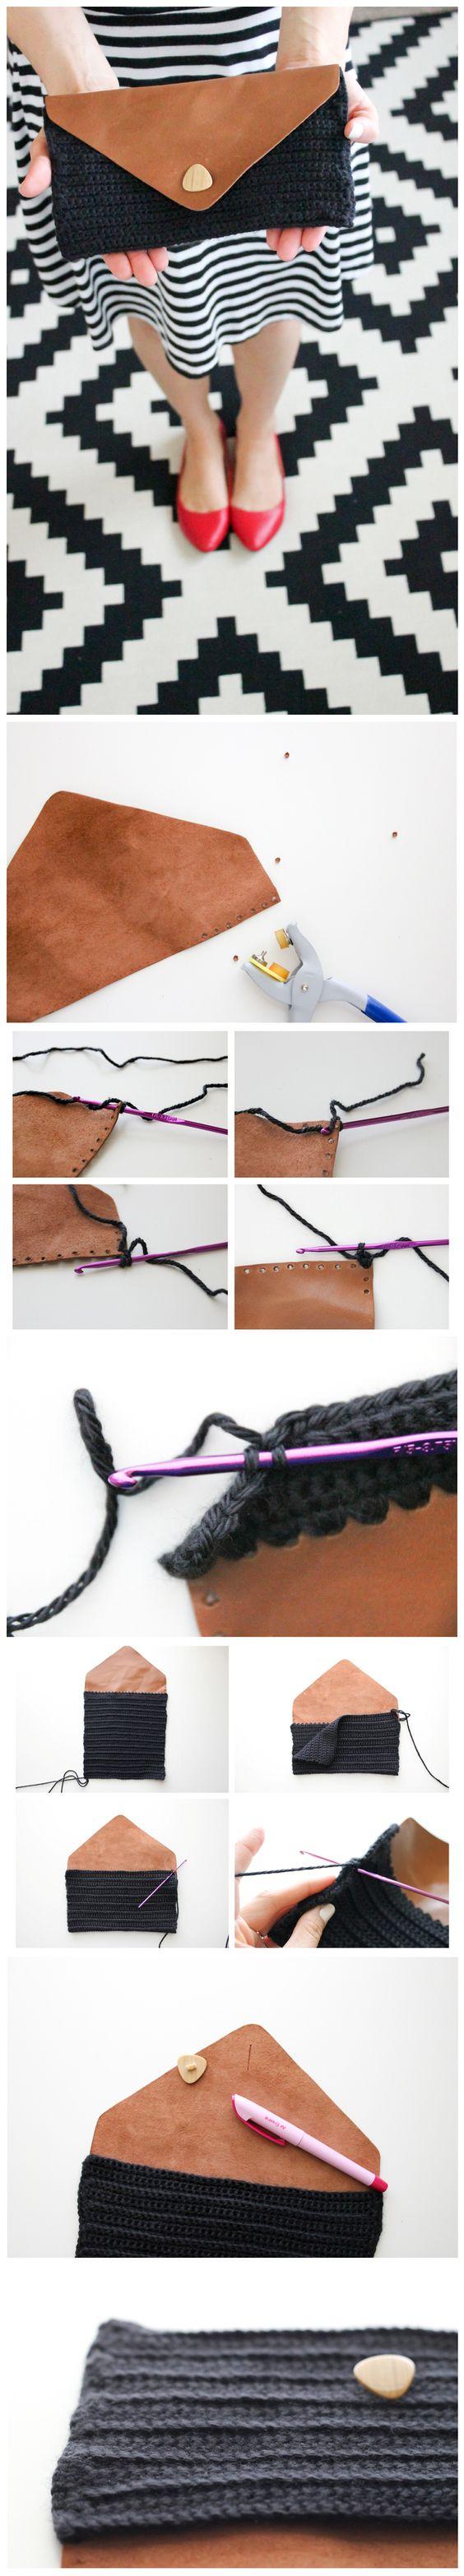 DIY crocheted leather flap clutch   ////   pochette cuir et crochet